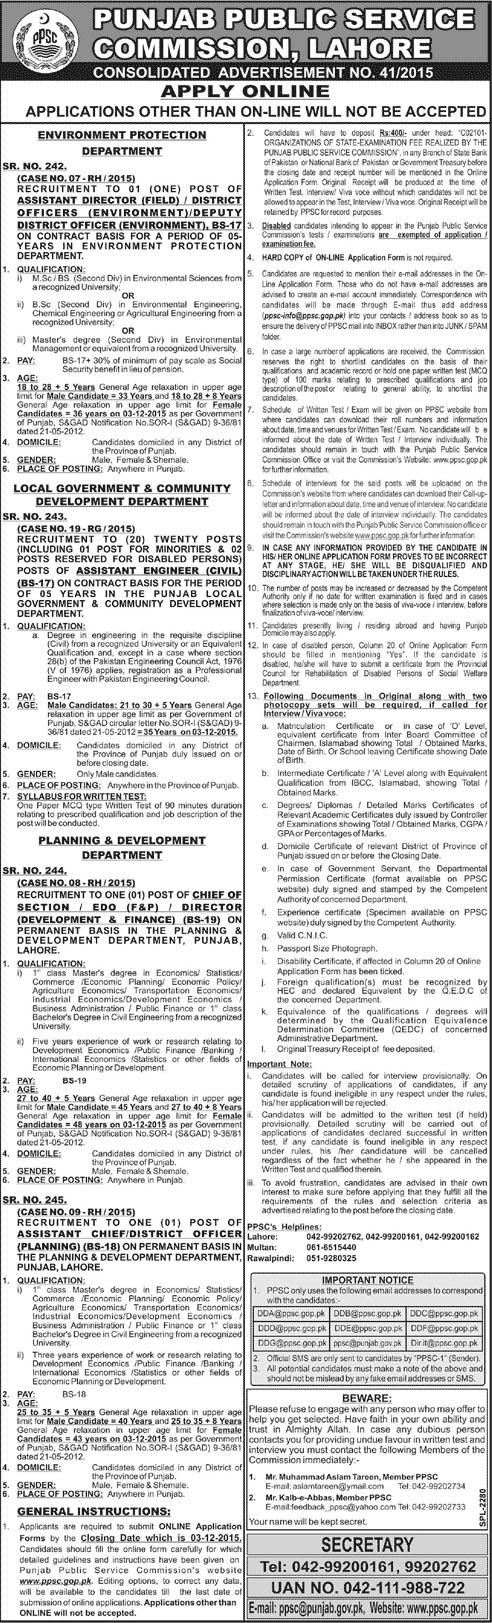 Jobs in Punjab Public Service Commission Lahore